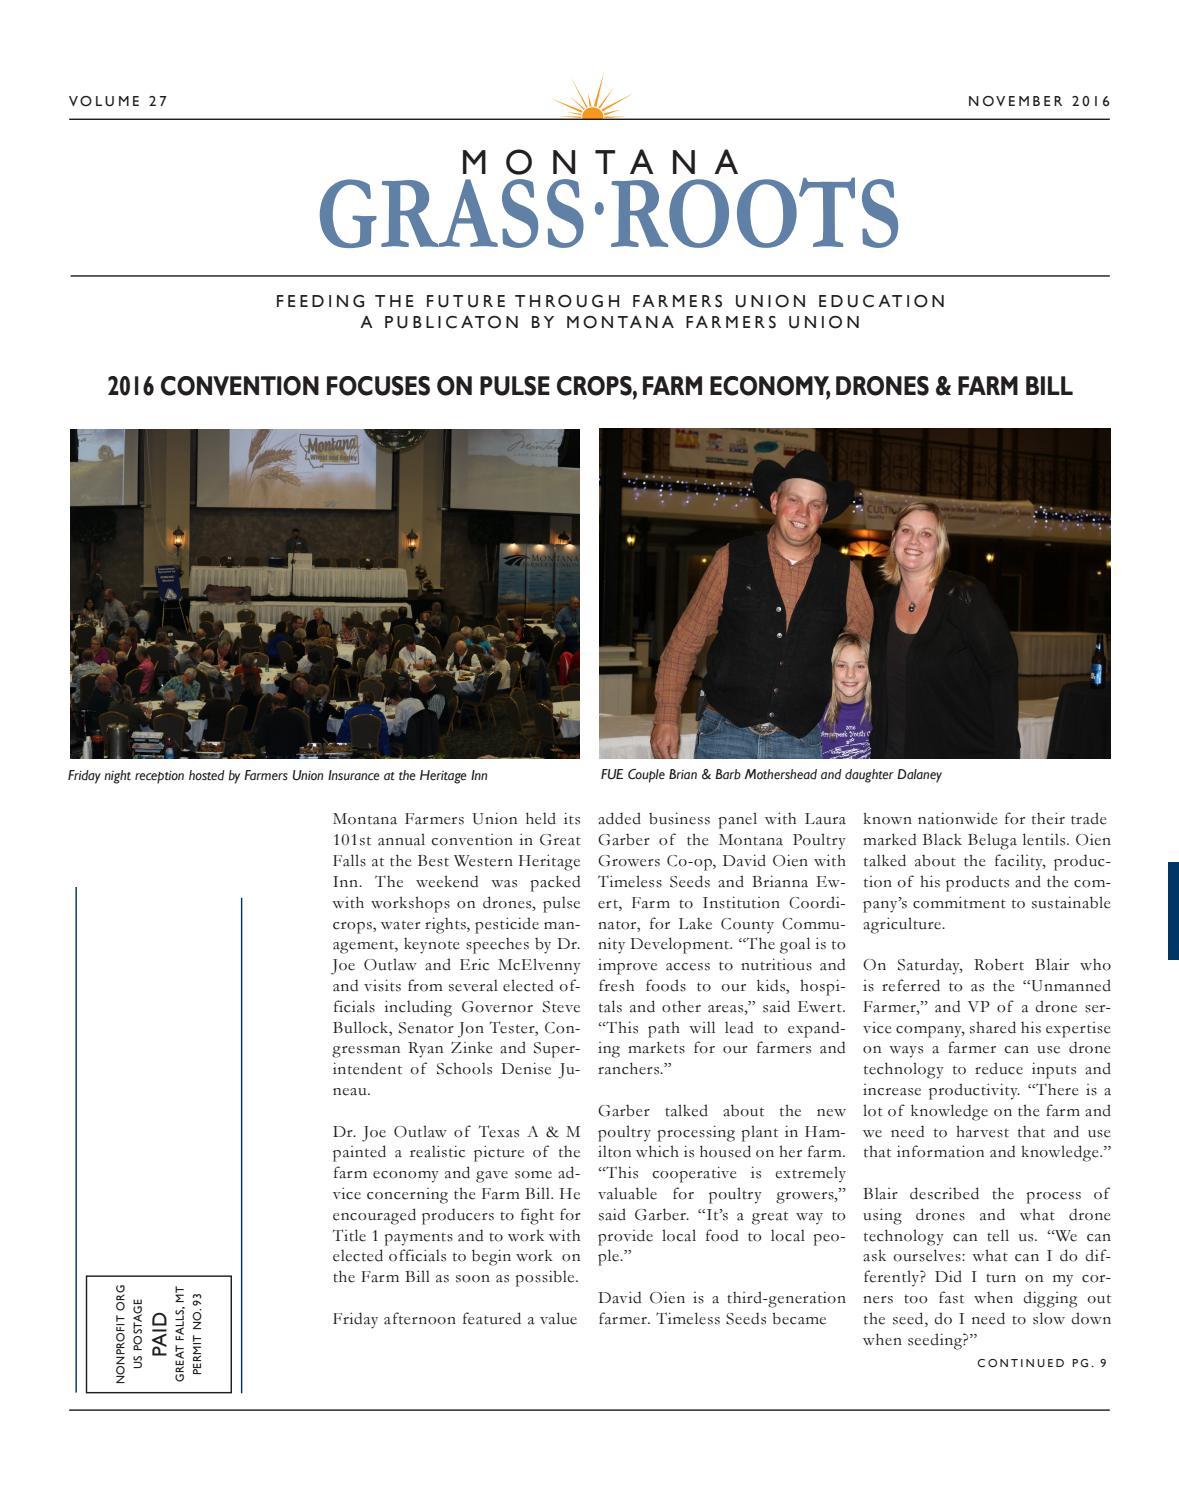 2016 November edition of Montana Grassroots by Montana